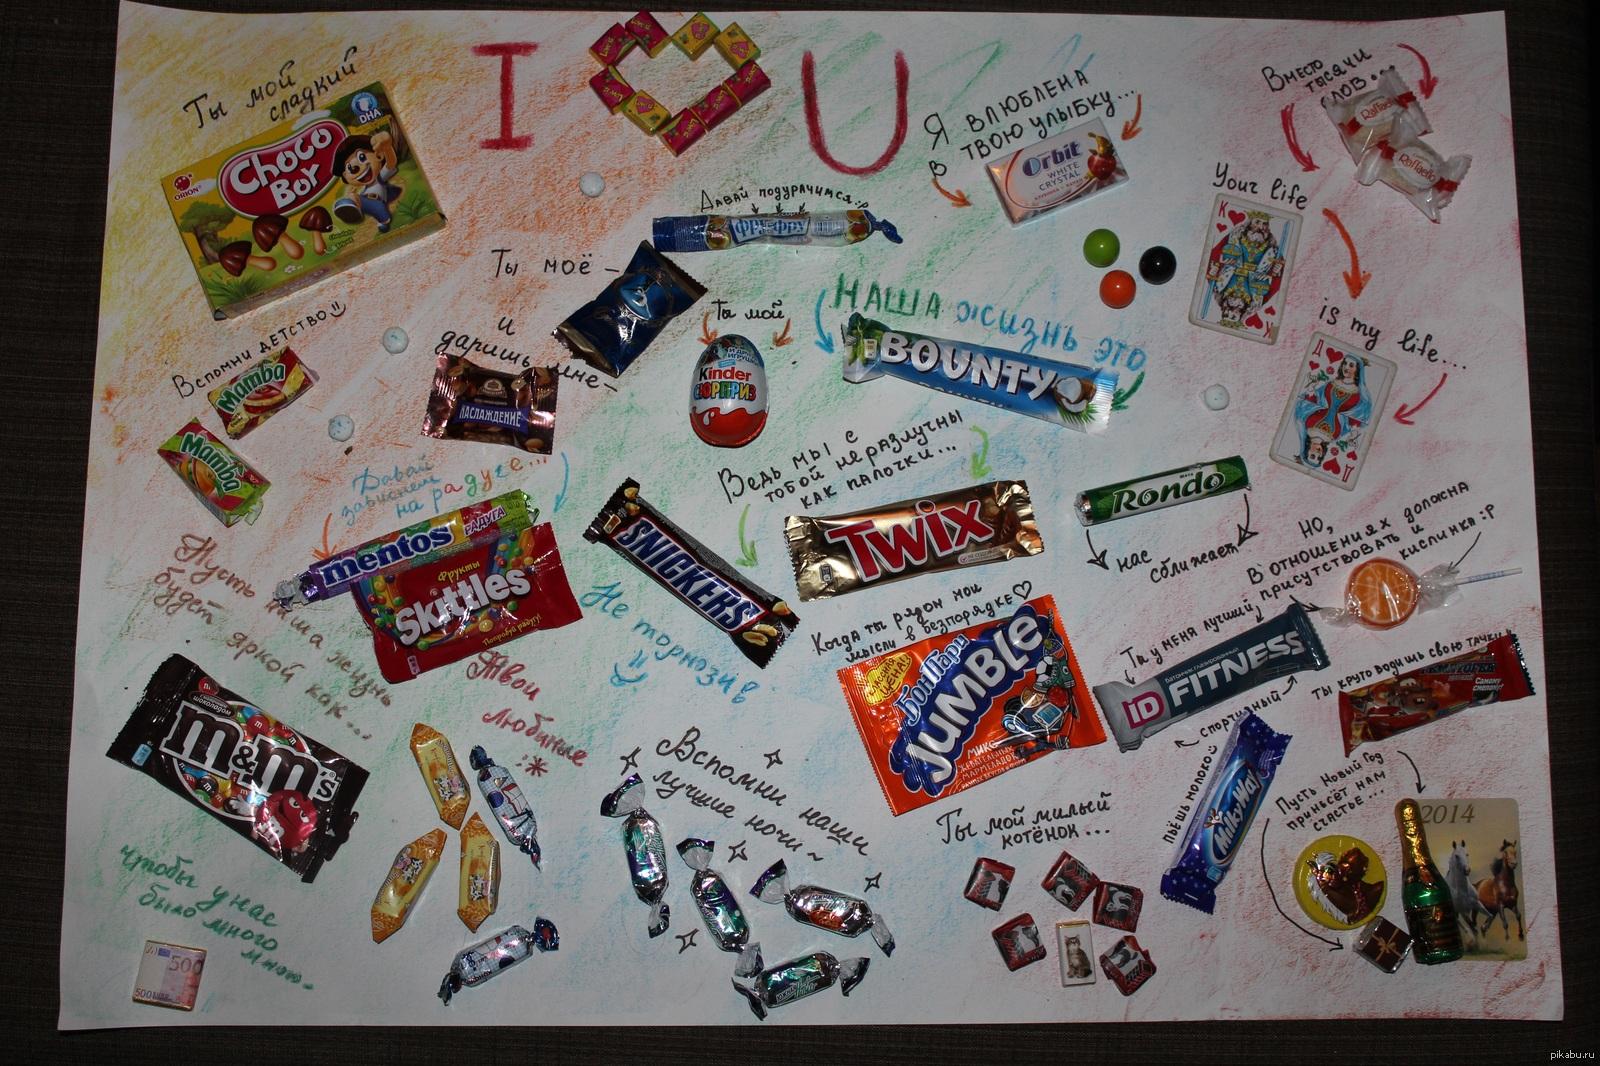 Поздравления с днем рождения на ватмане с шоколадками фото